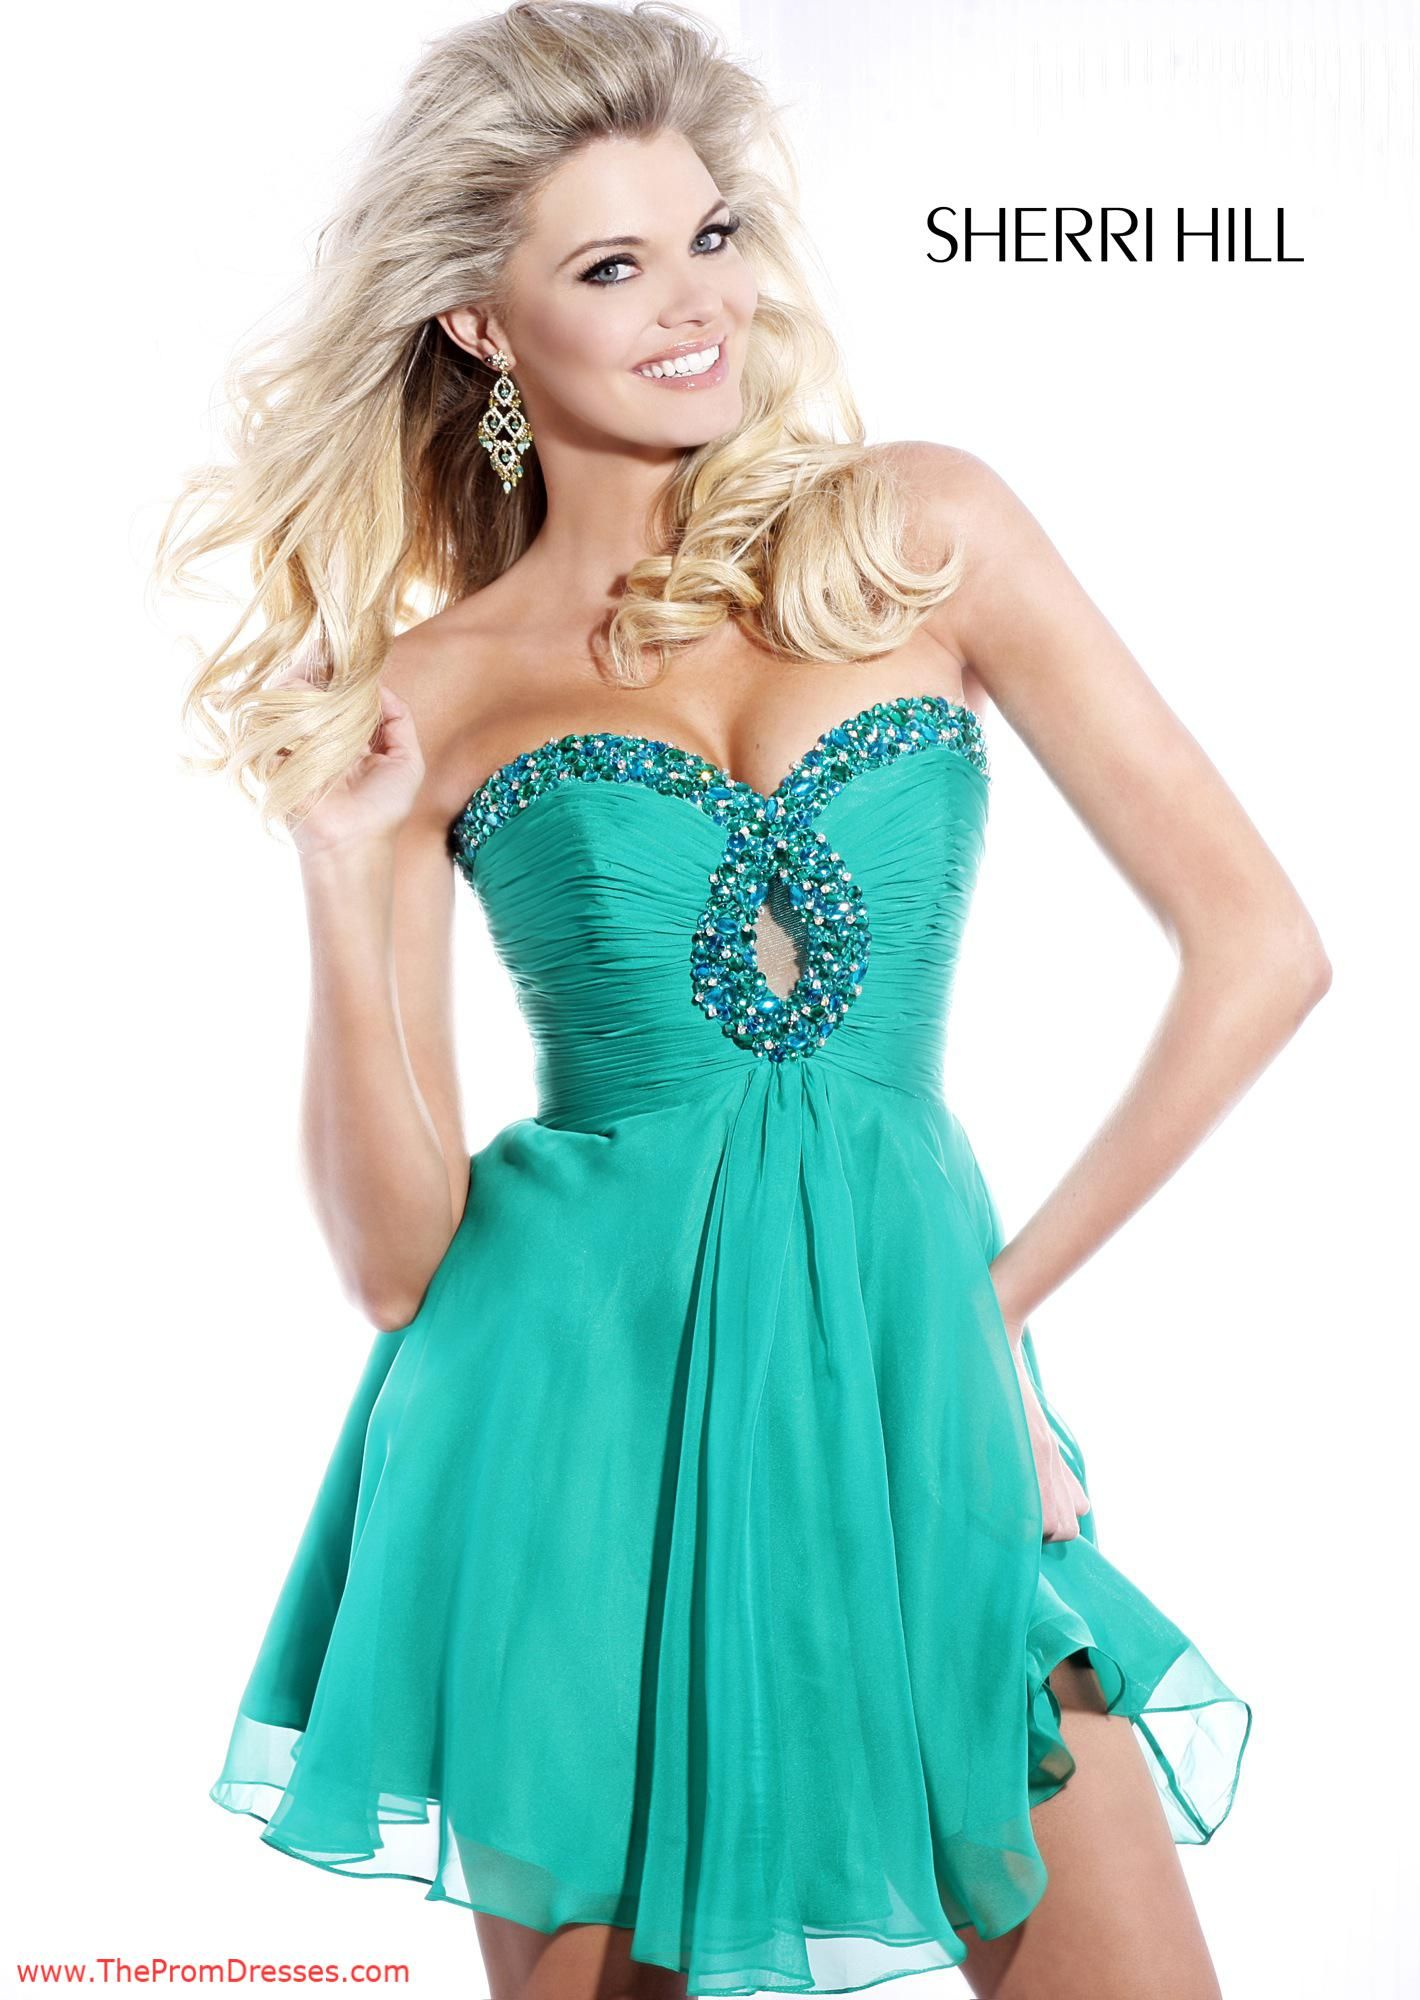 Sherri hill teal dress most popular dress styles pinterest